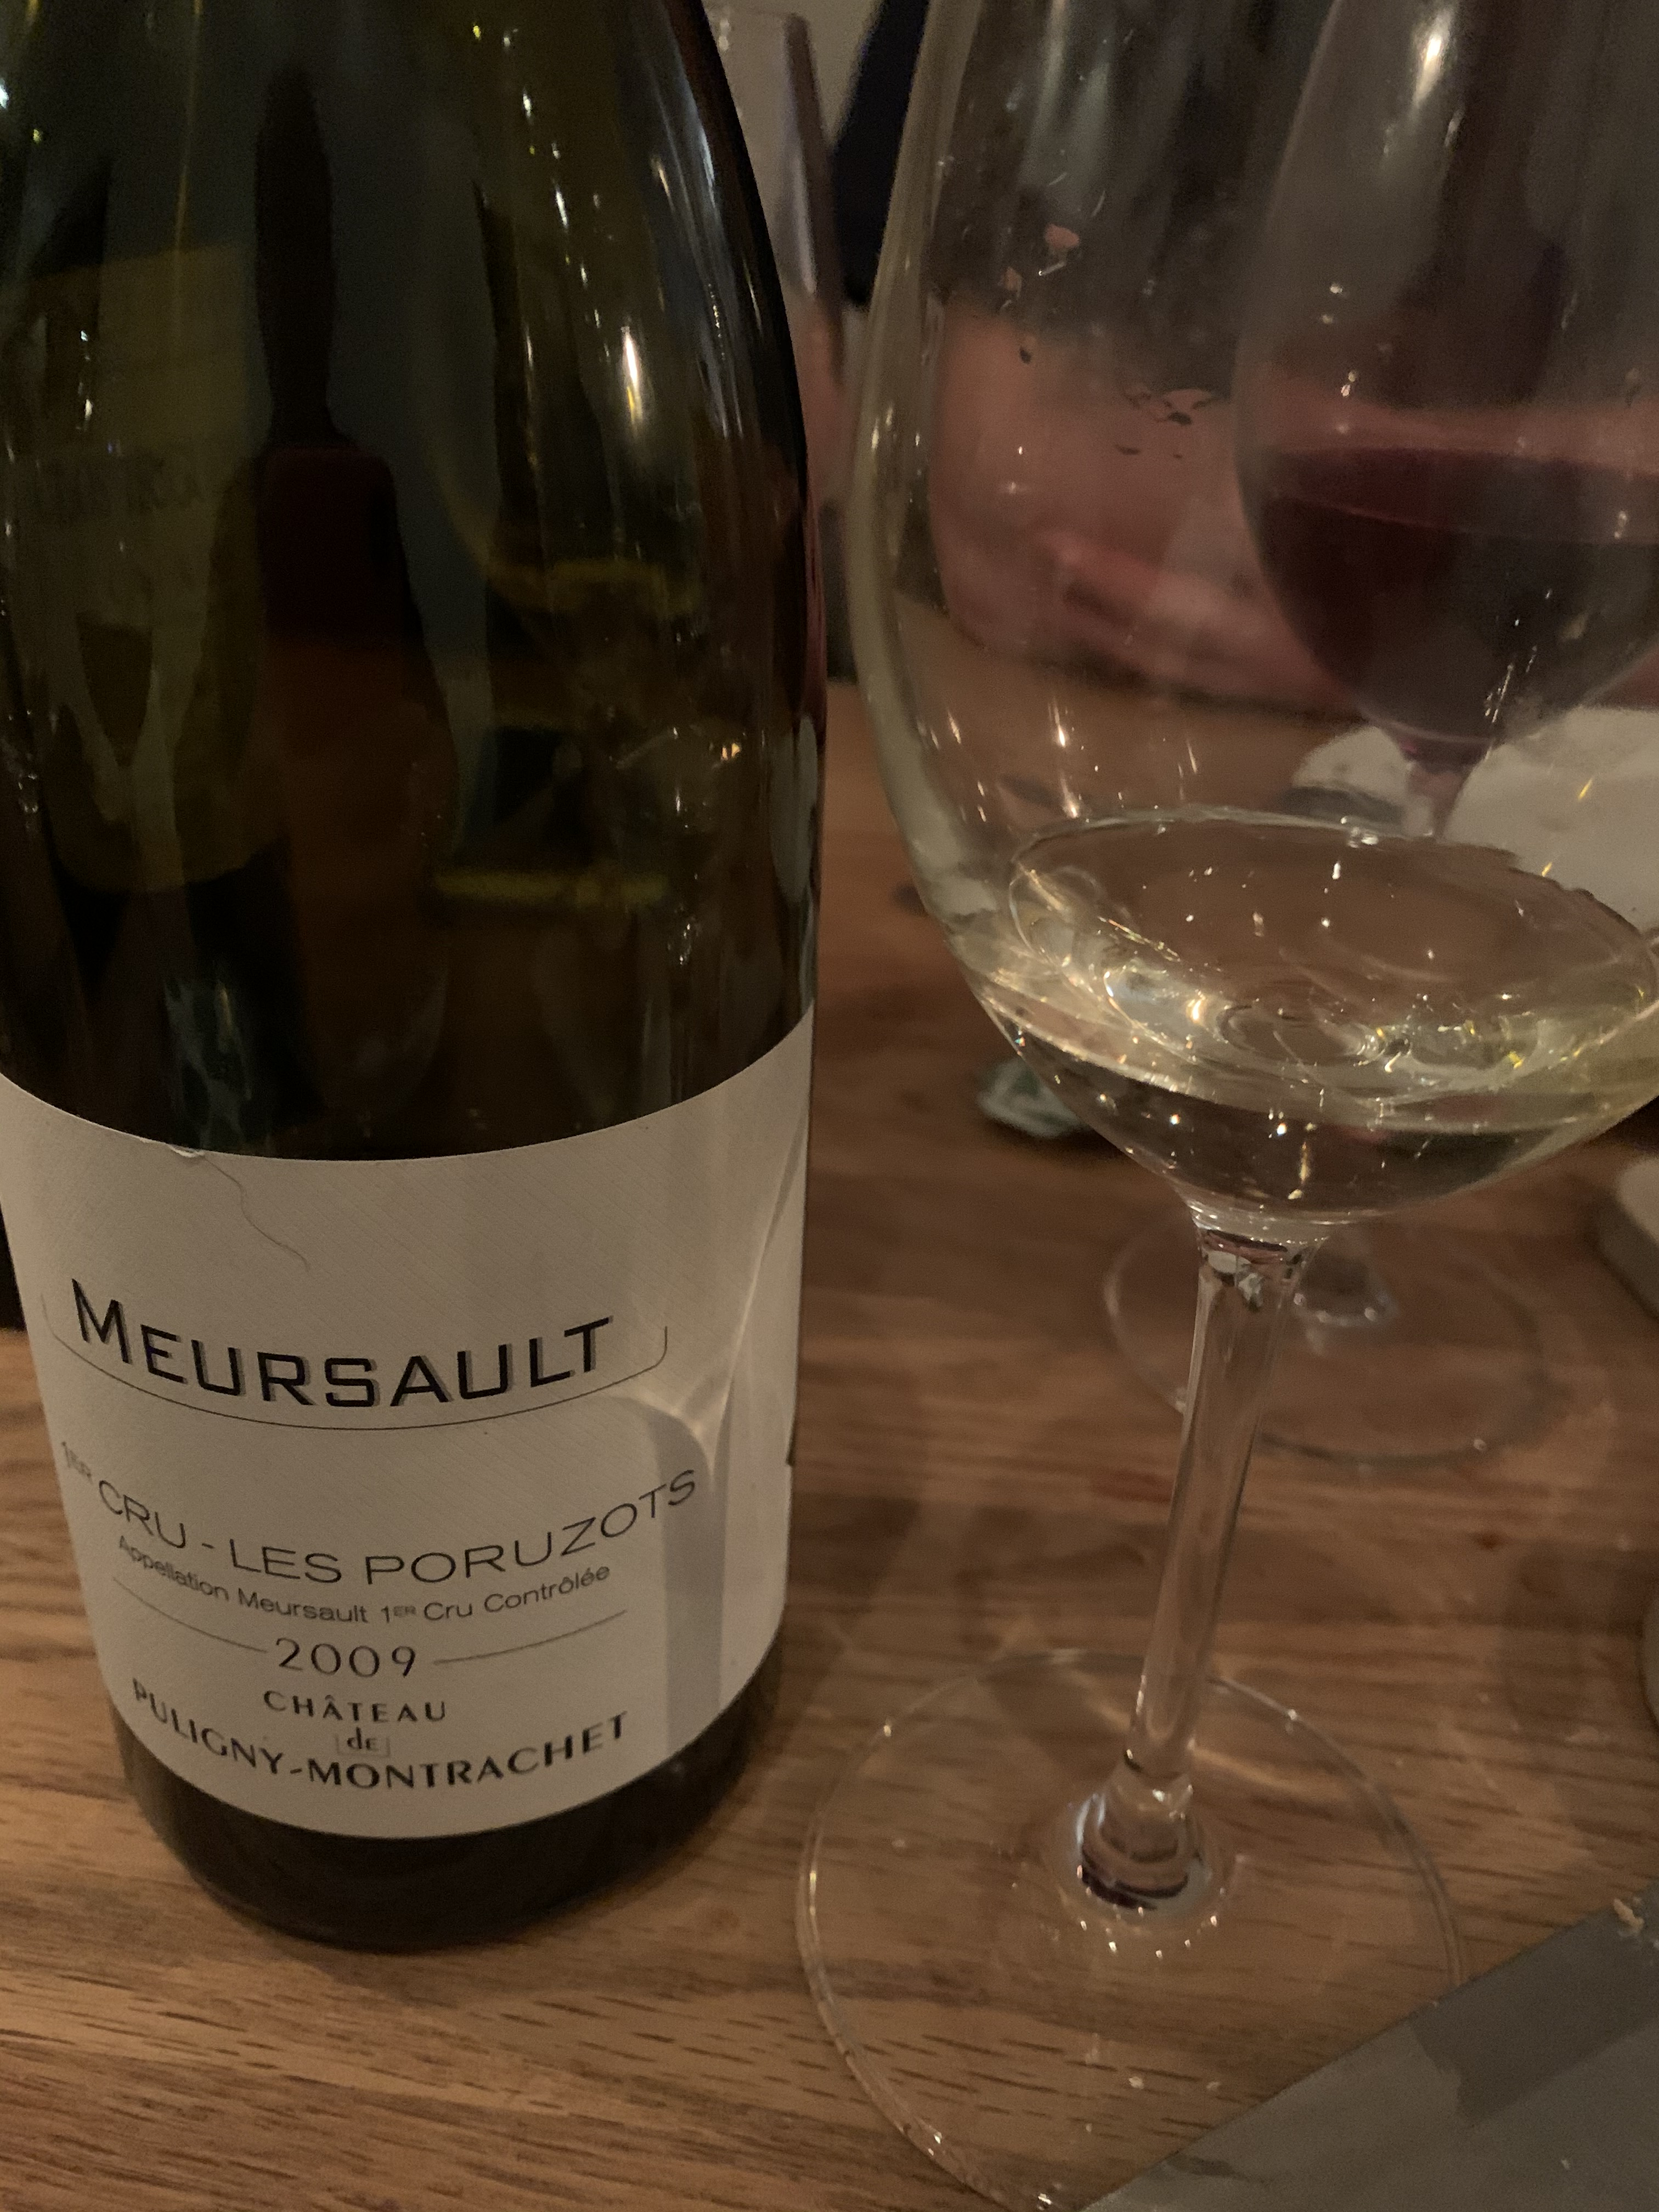 Meursault Premier Cru Les Poruzots 2009